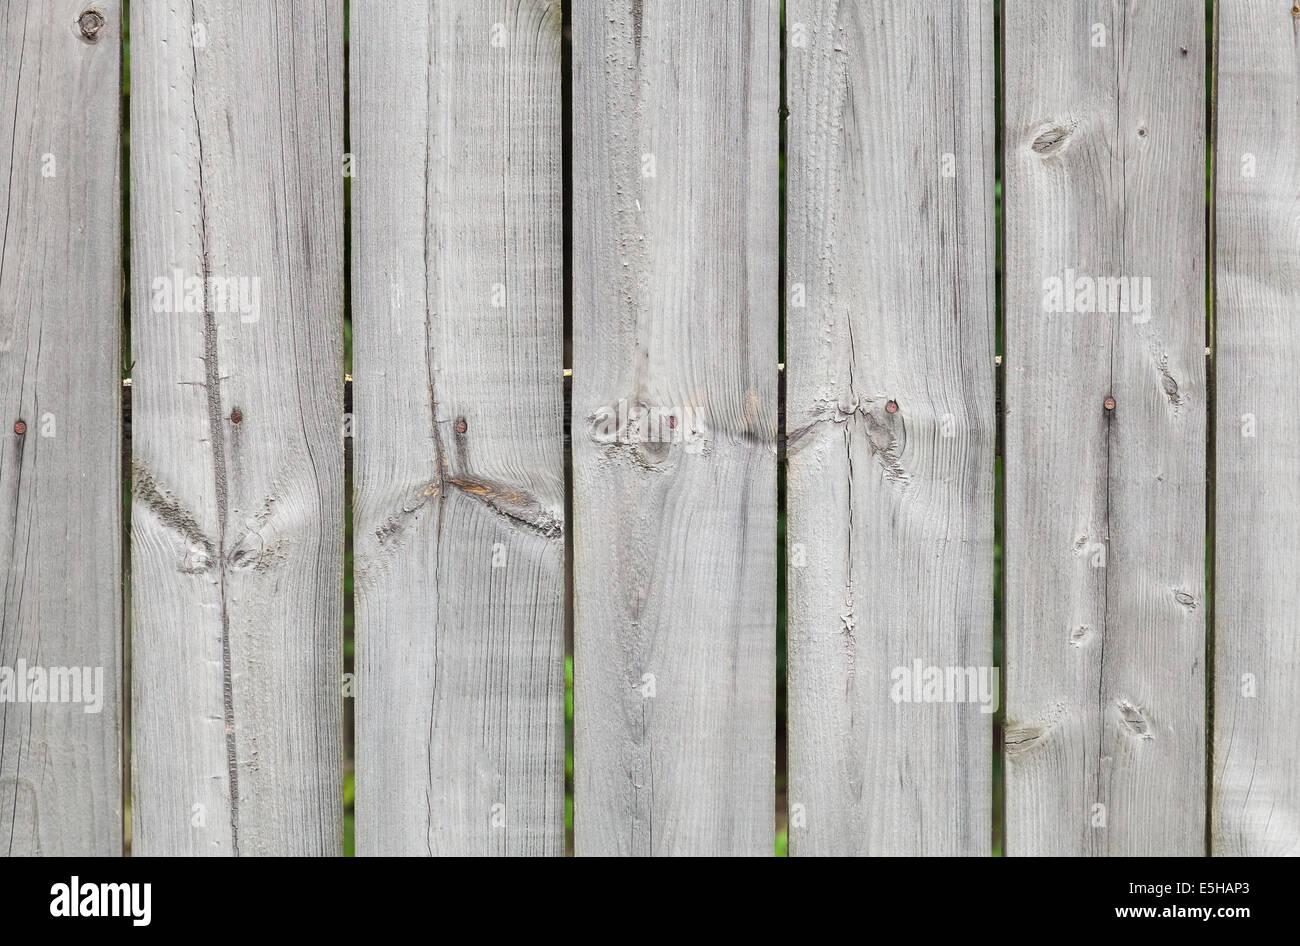 Old Grey Plank Fence Stockfotos & Old Grey Plank Fence Bilder Alamy